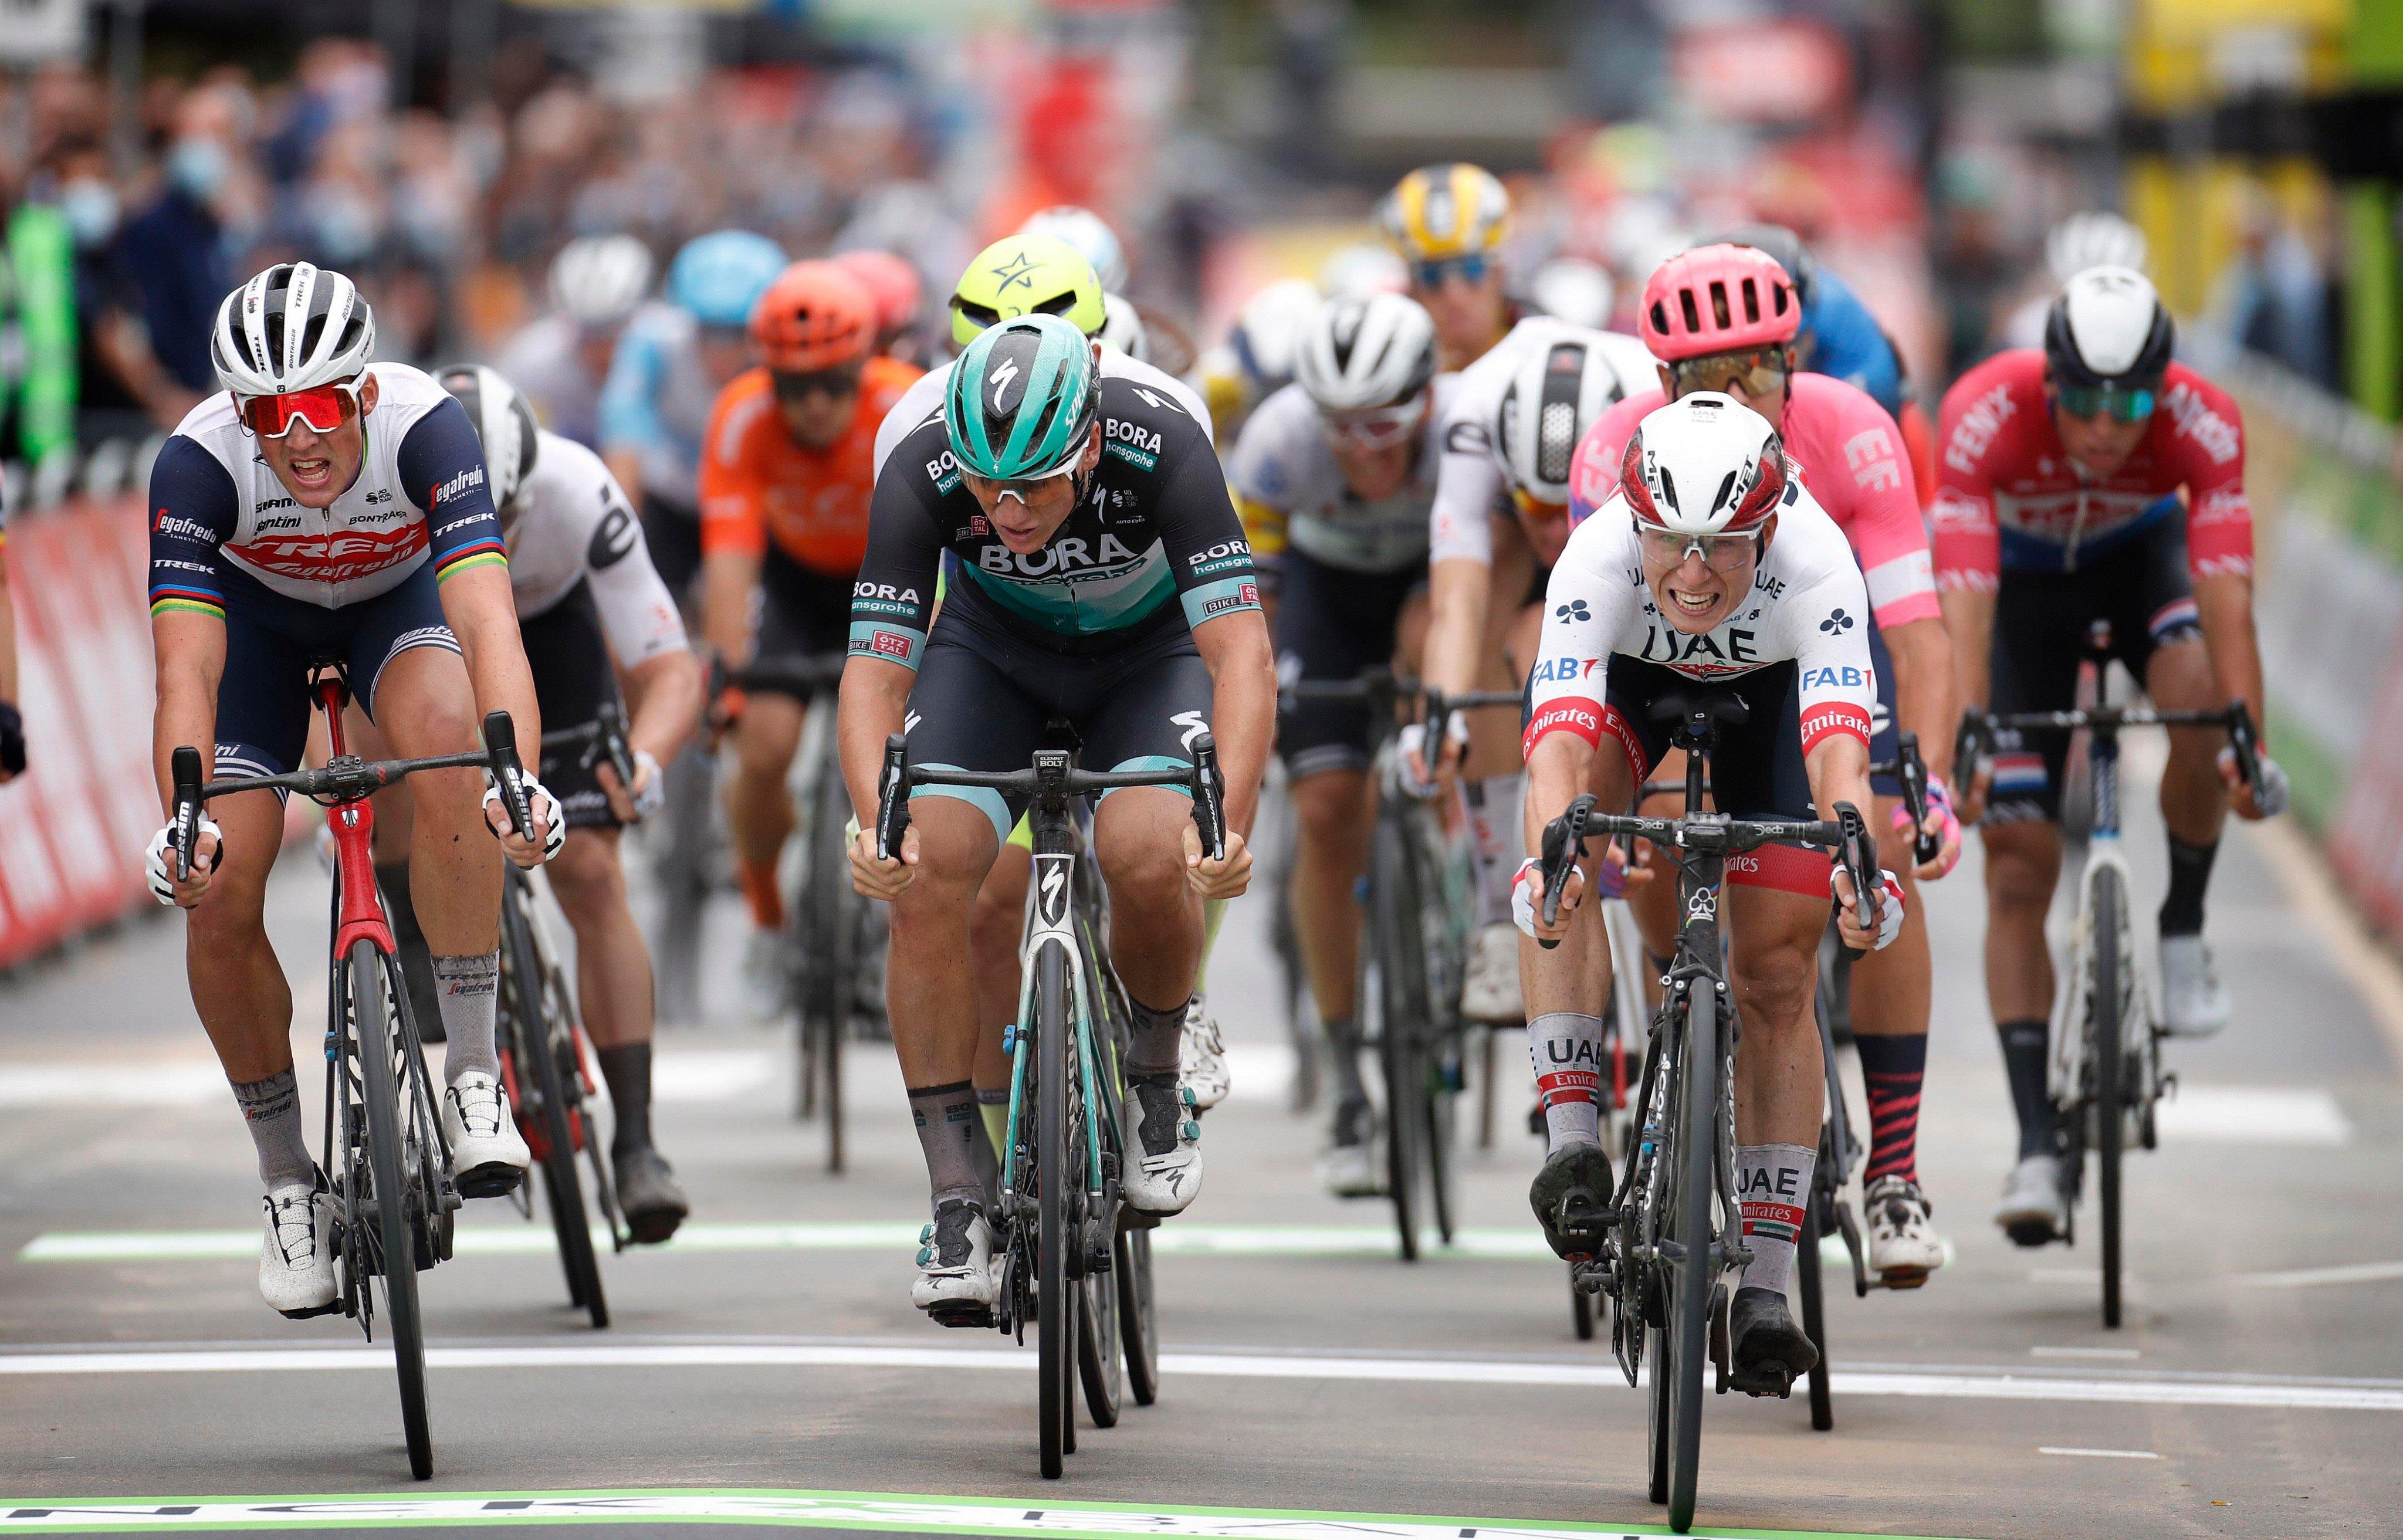 Jasper Philipsen ganó la primera etapa del Binck Bank Tour 2020.